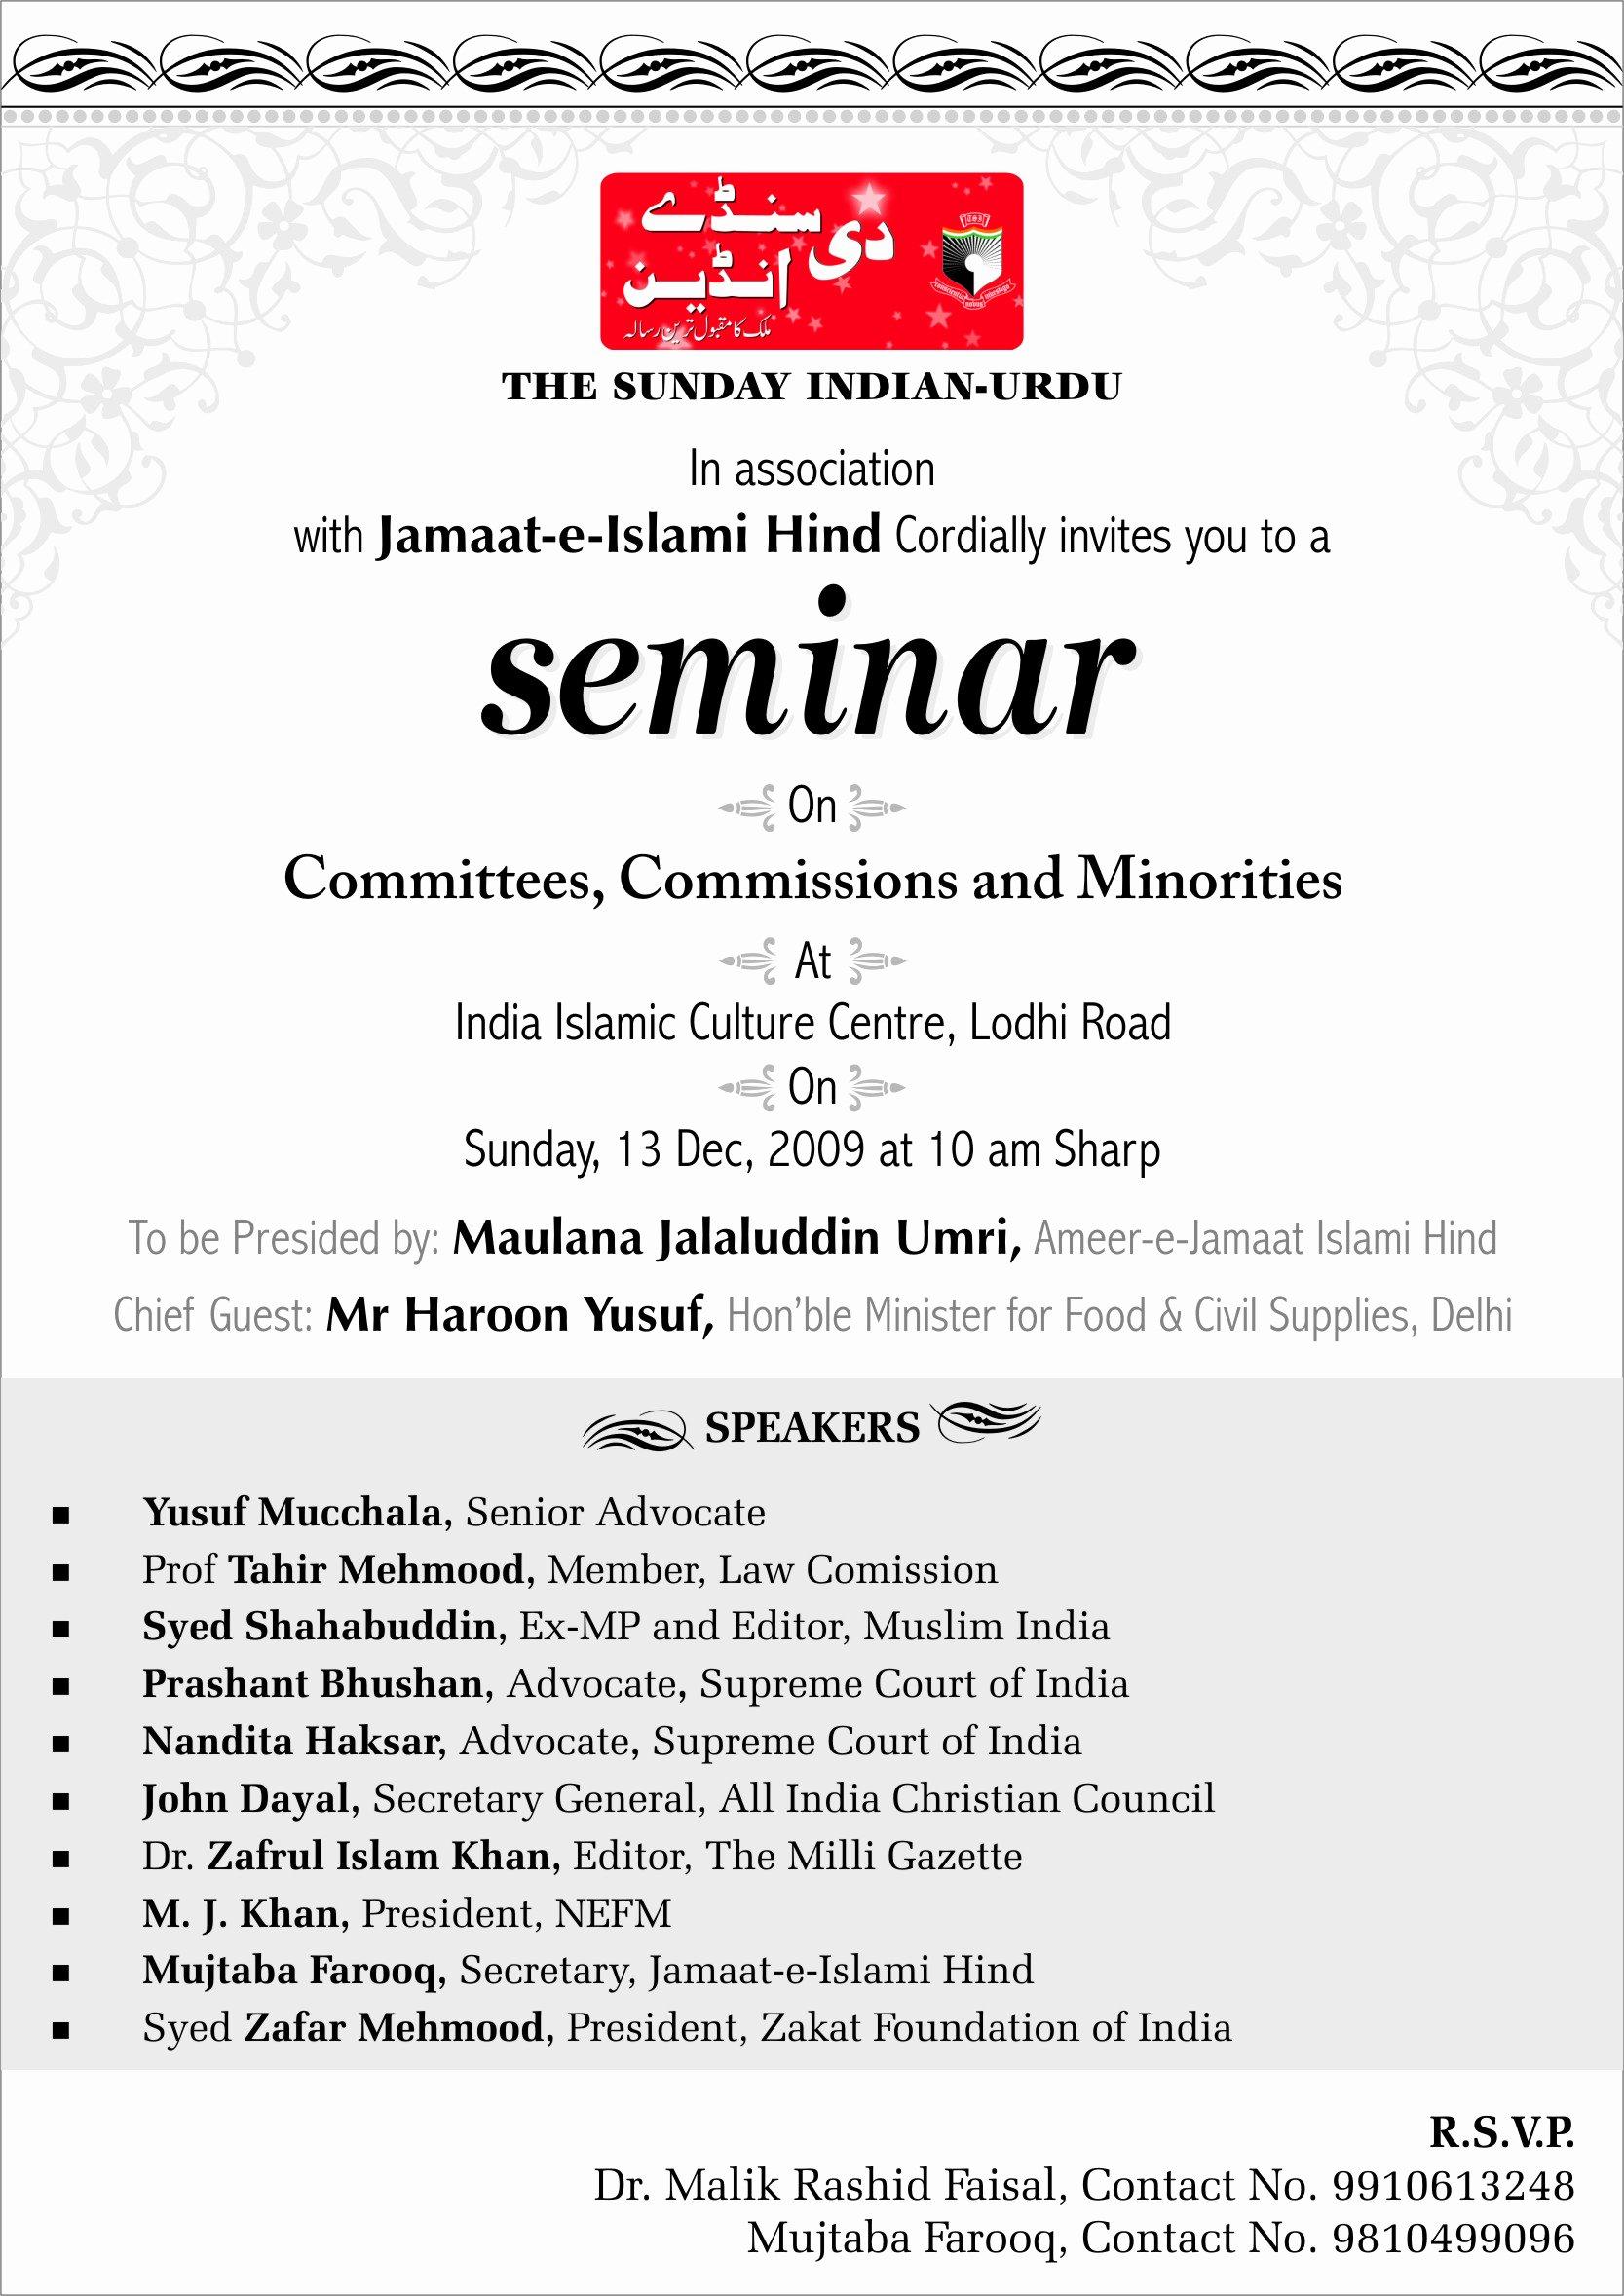 Seminar Invitation Template Best Of Invitation for Seminar Eyerunforpob